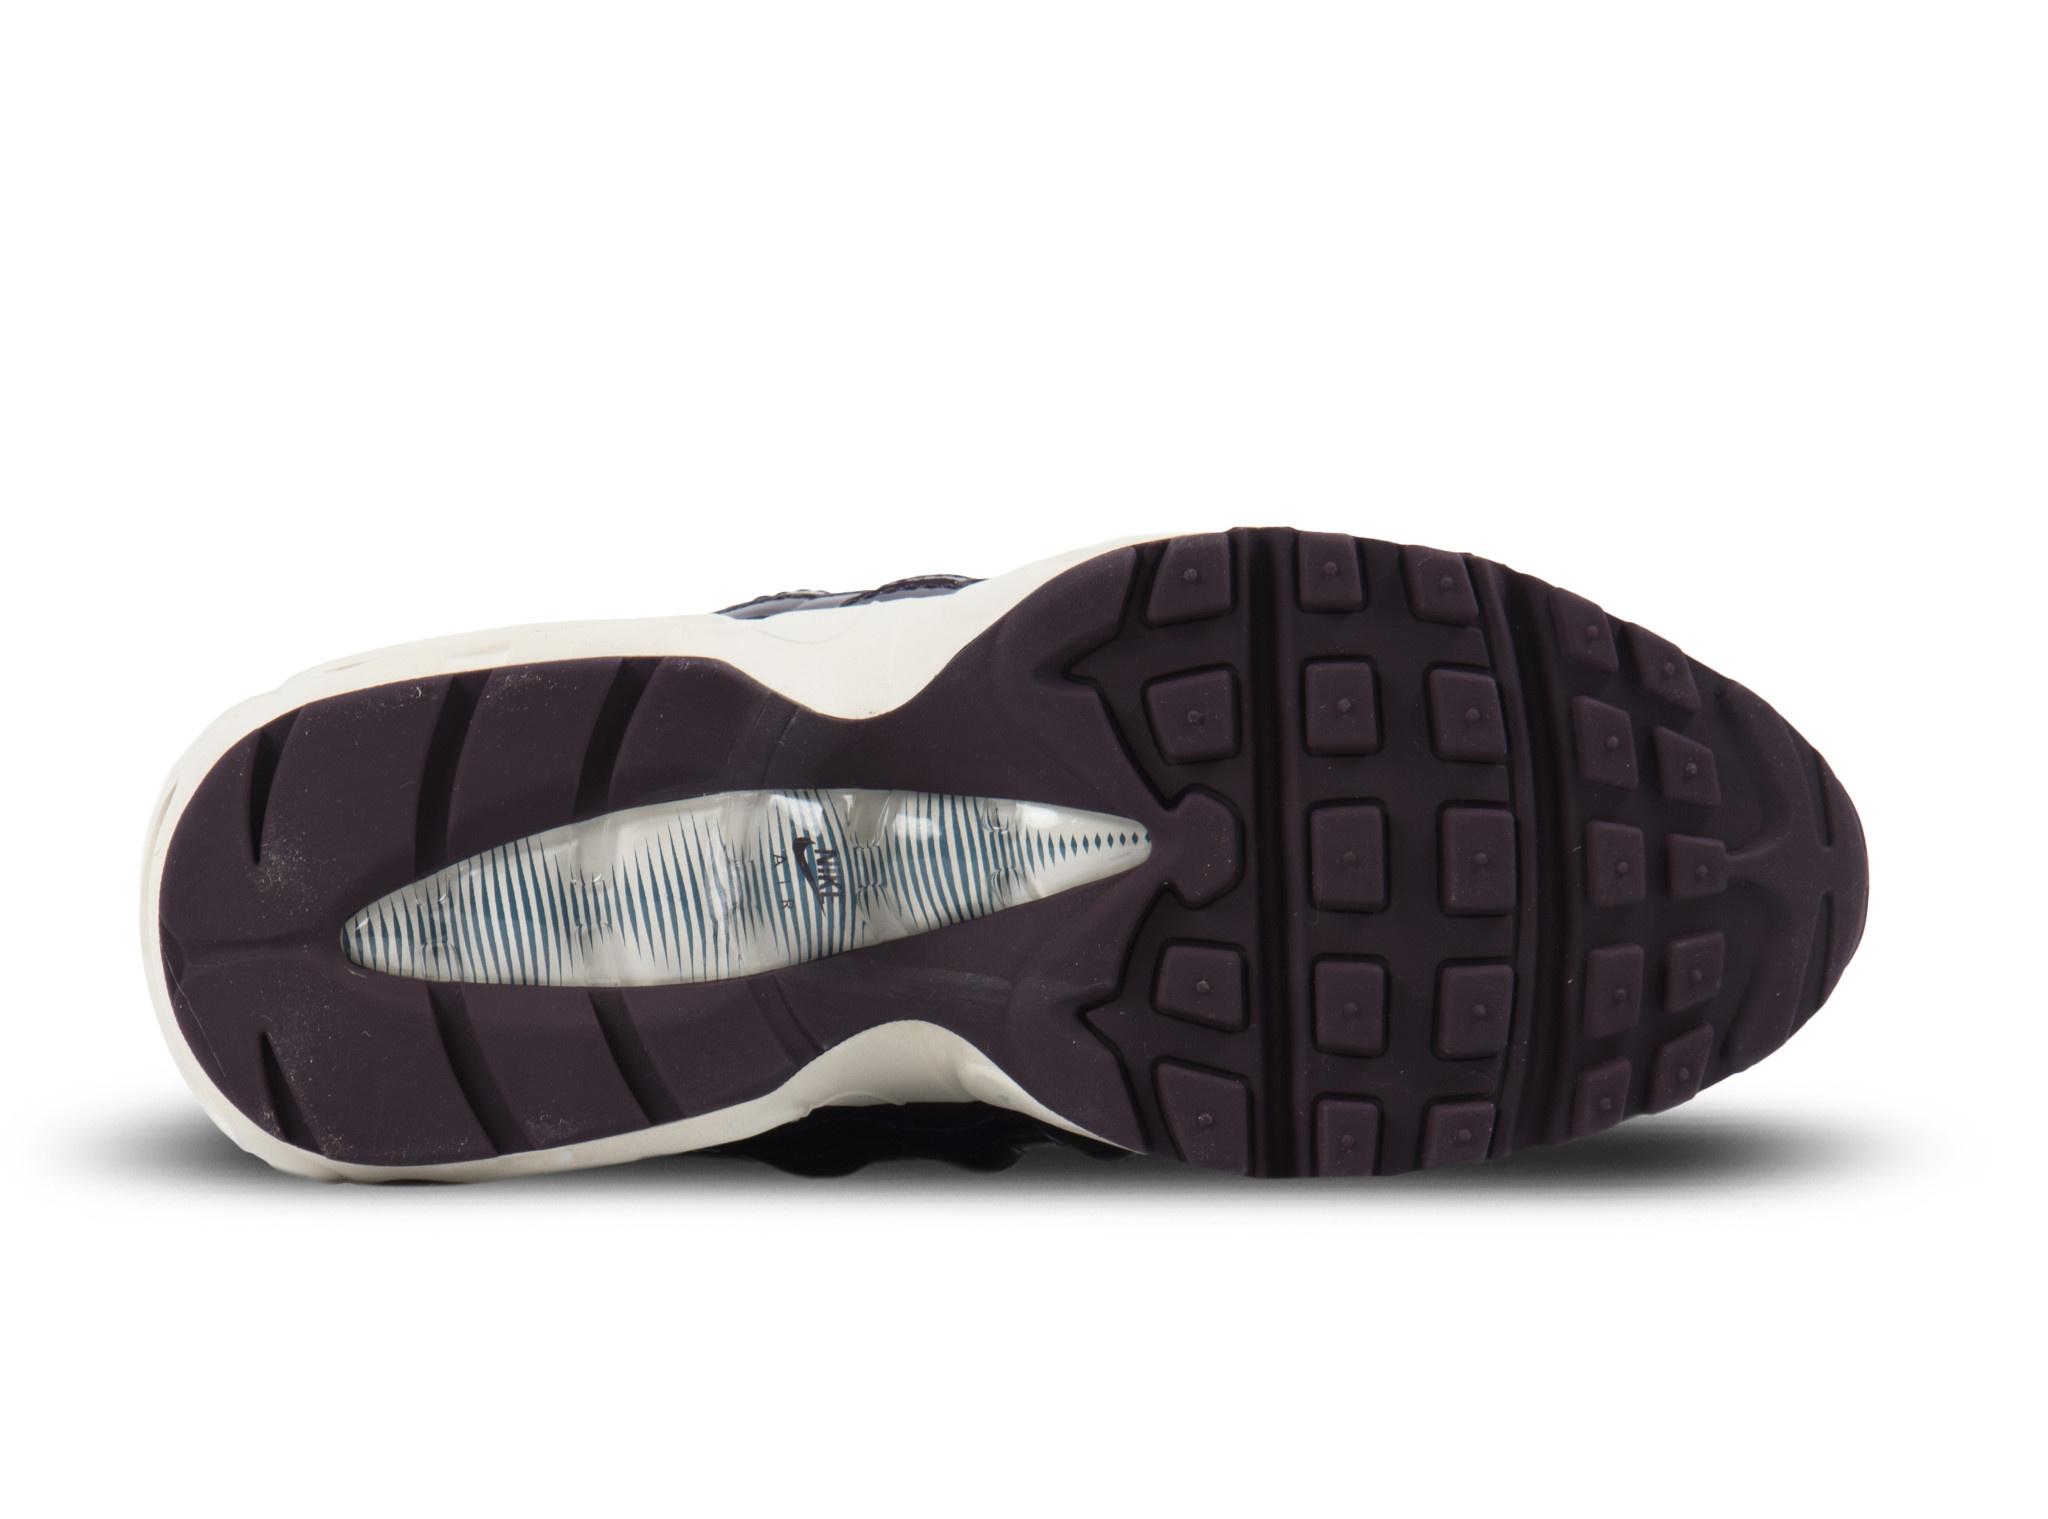 Nike Women's Air Max 95 Port WineBordeaux White 307960 602